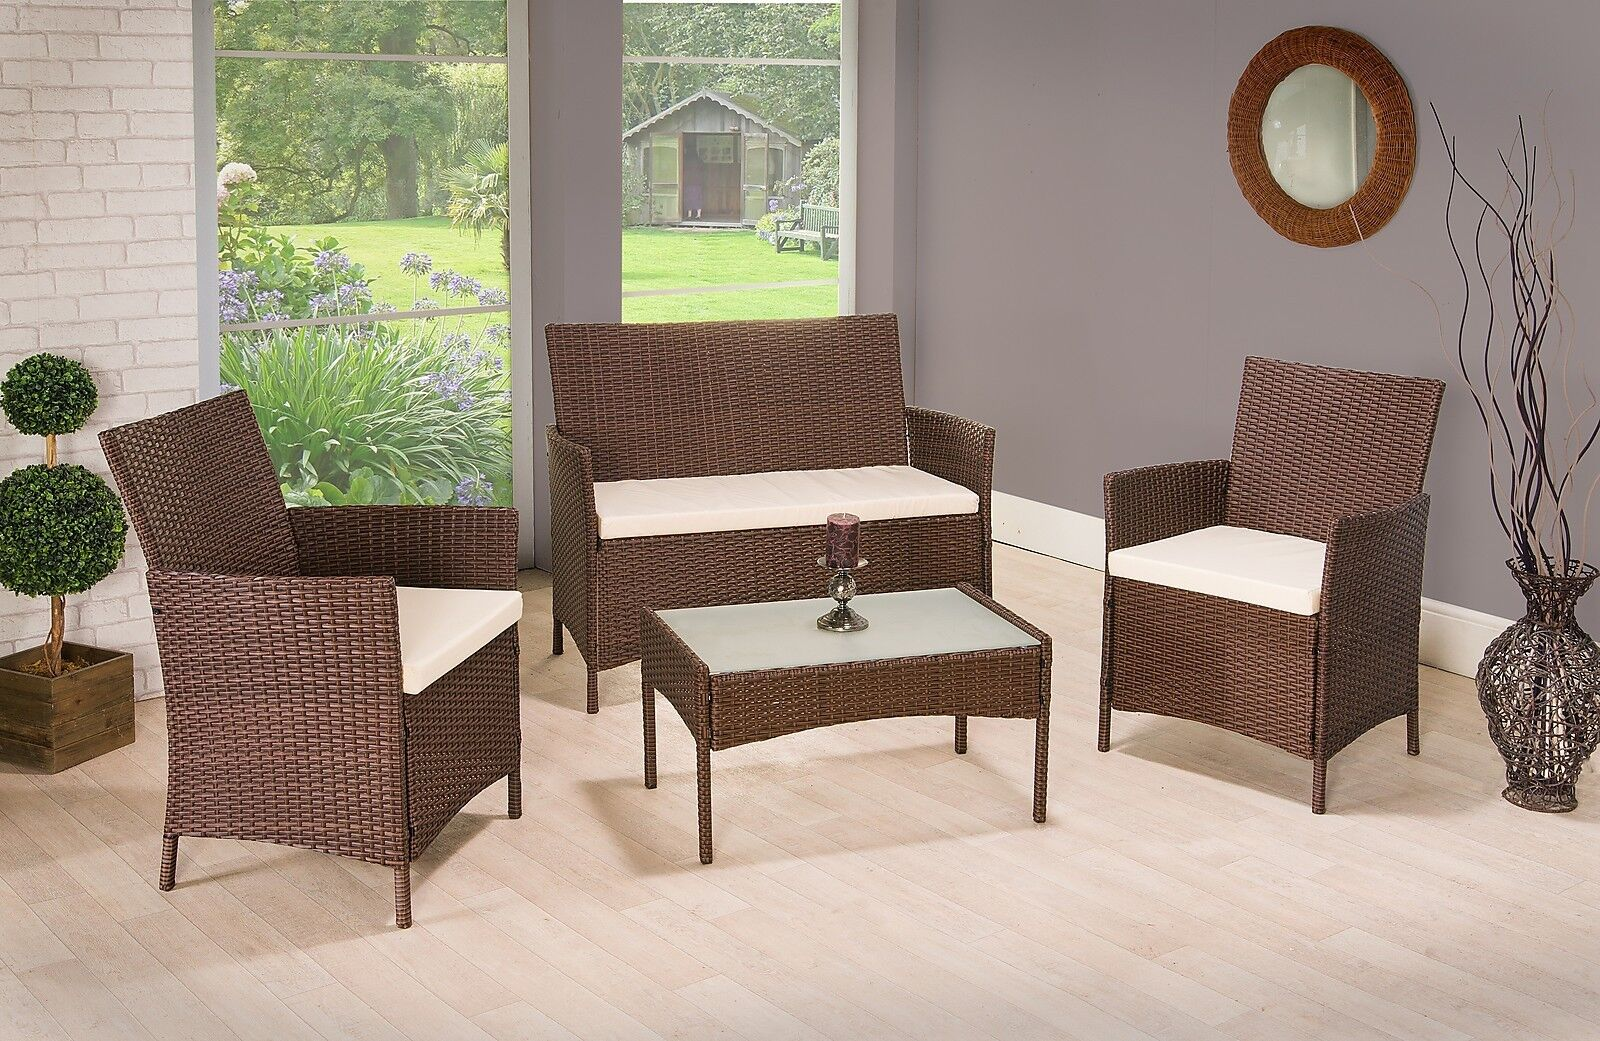 Garden Furniture - RATTAN GARDEN FURNITURE SET CHAIRS SOFA TABLE OUTDOOR PATIO CONSERVATORY WICKER